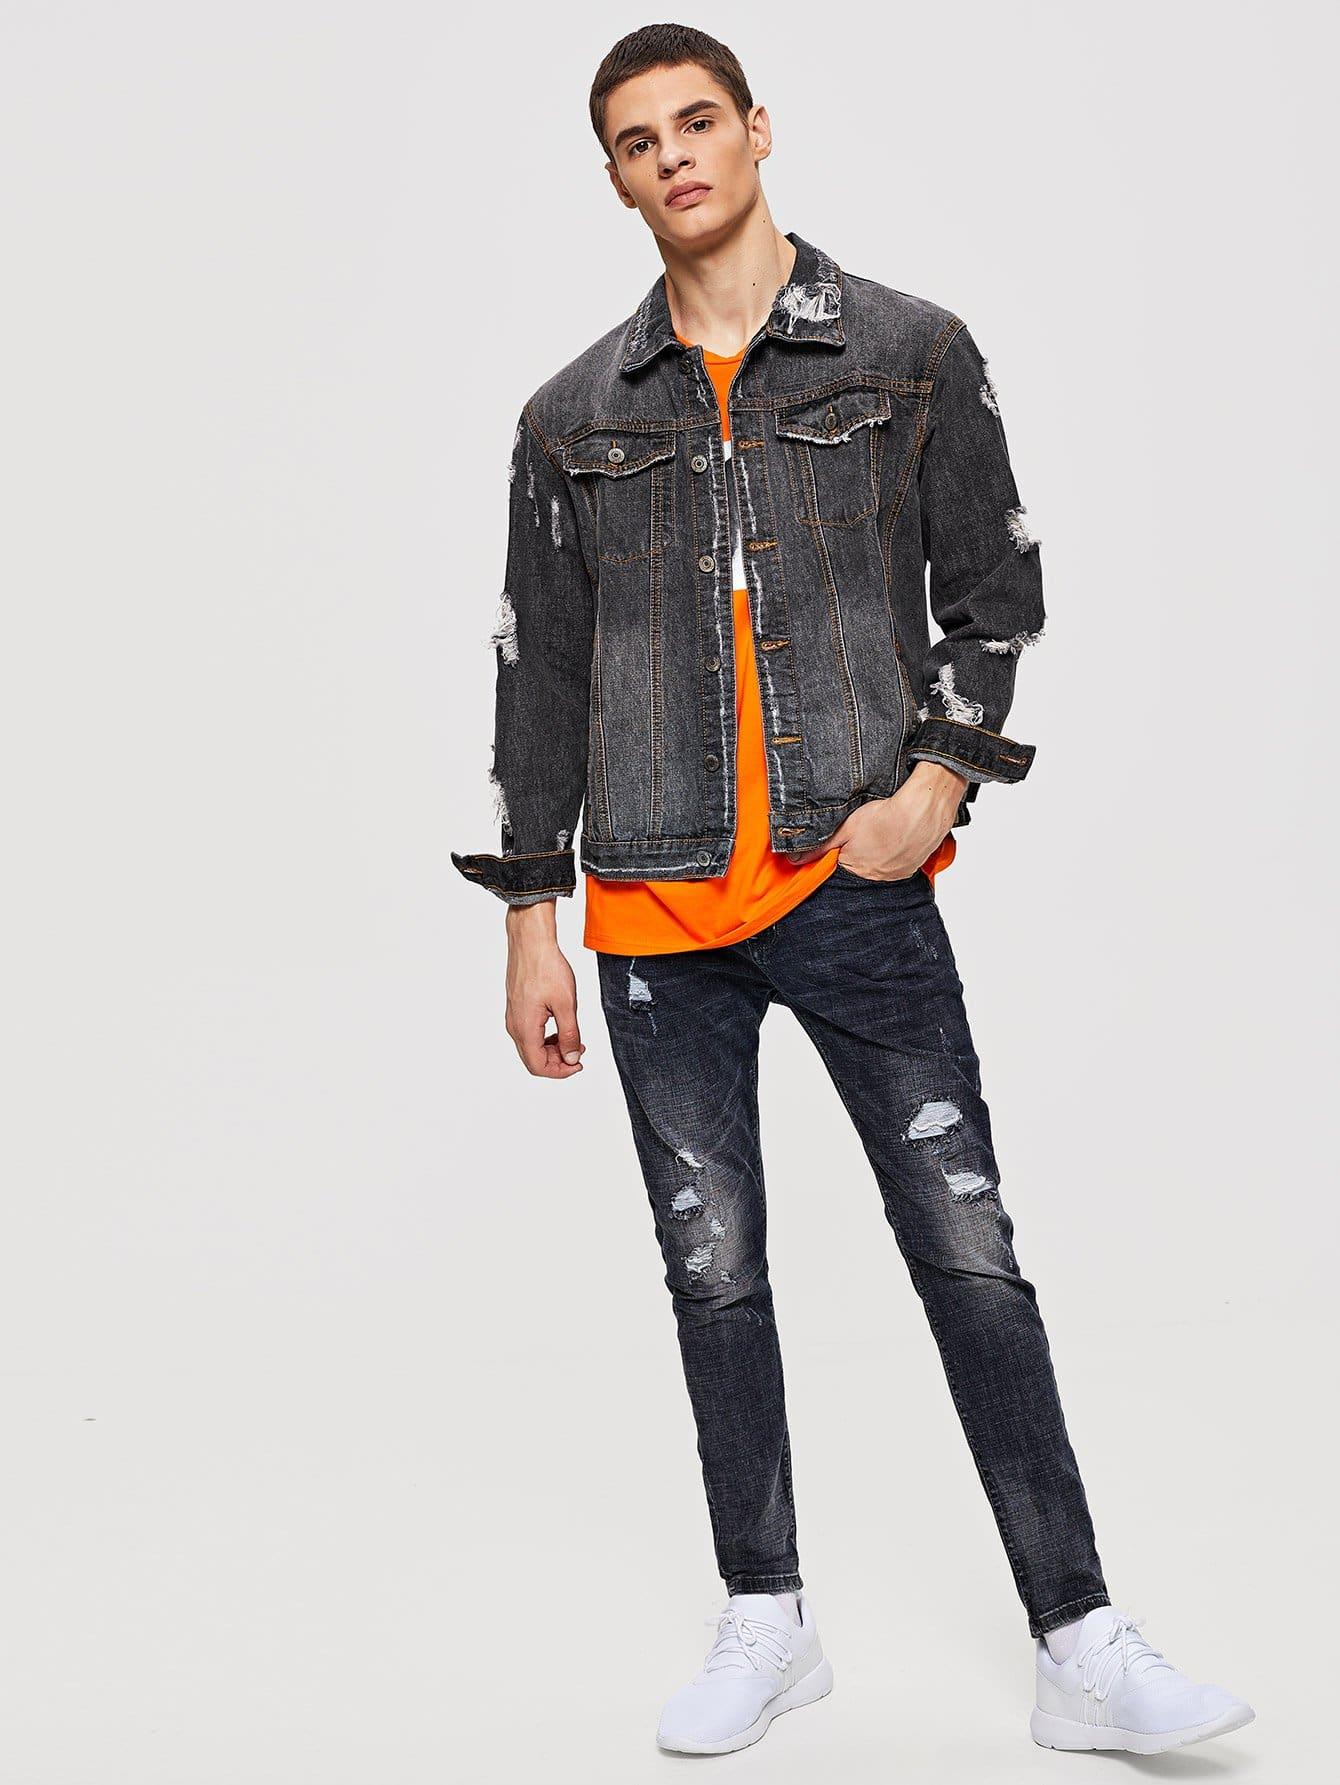 m nner zerrissene jeans jacke german shein sheinside. Black Bedroom Furniture Sets. Home Design Ideas